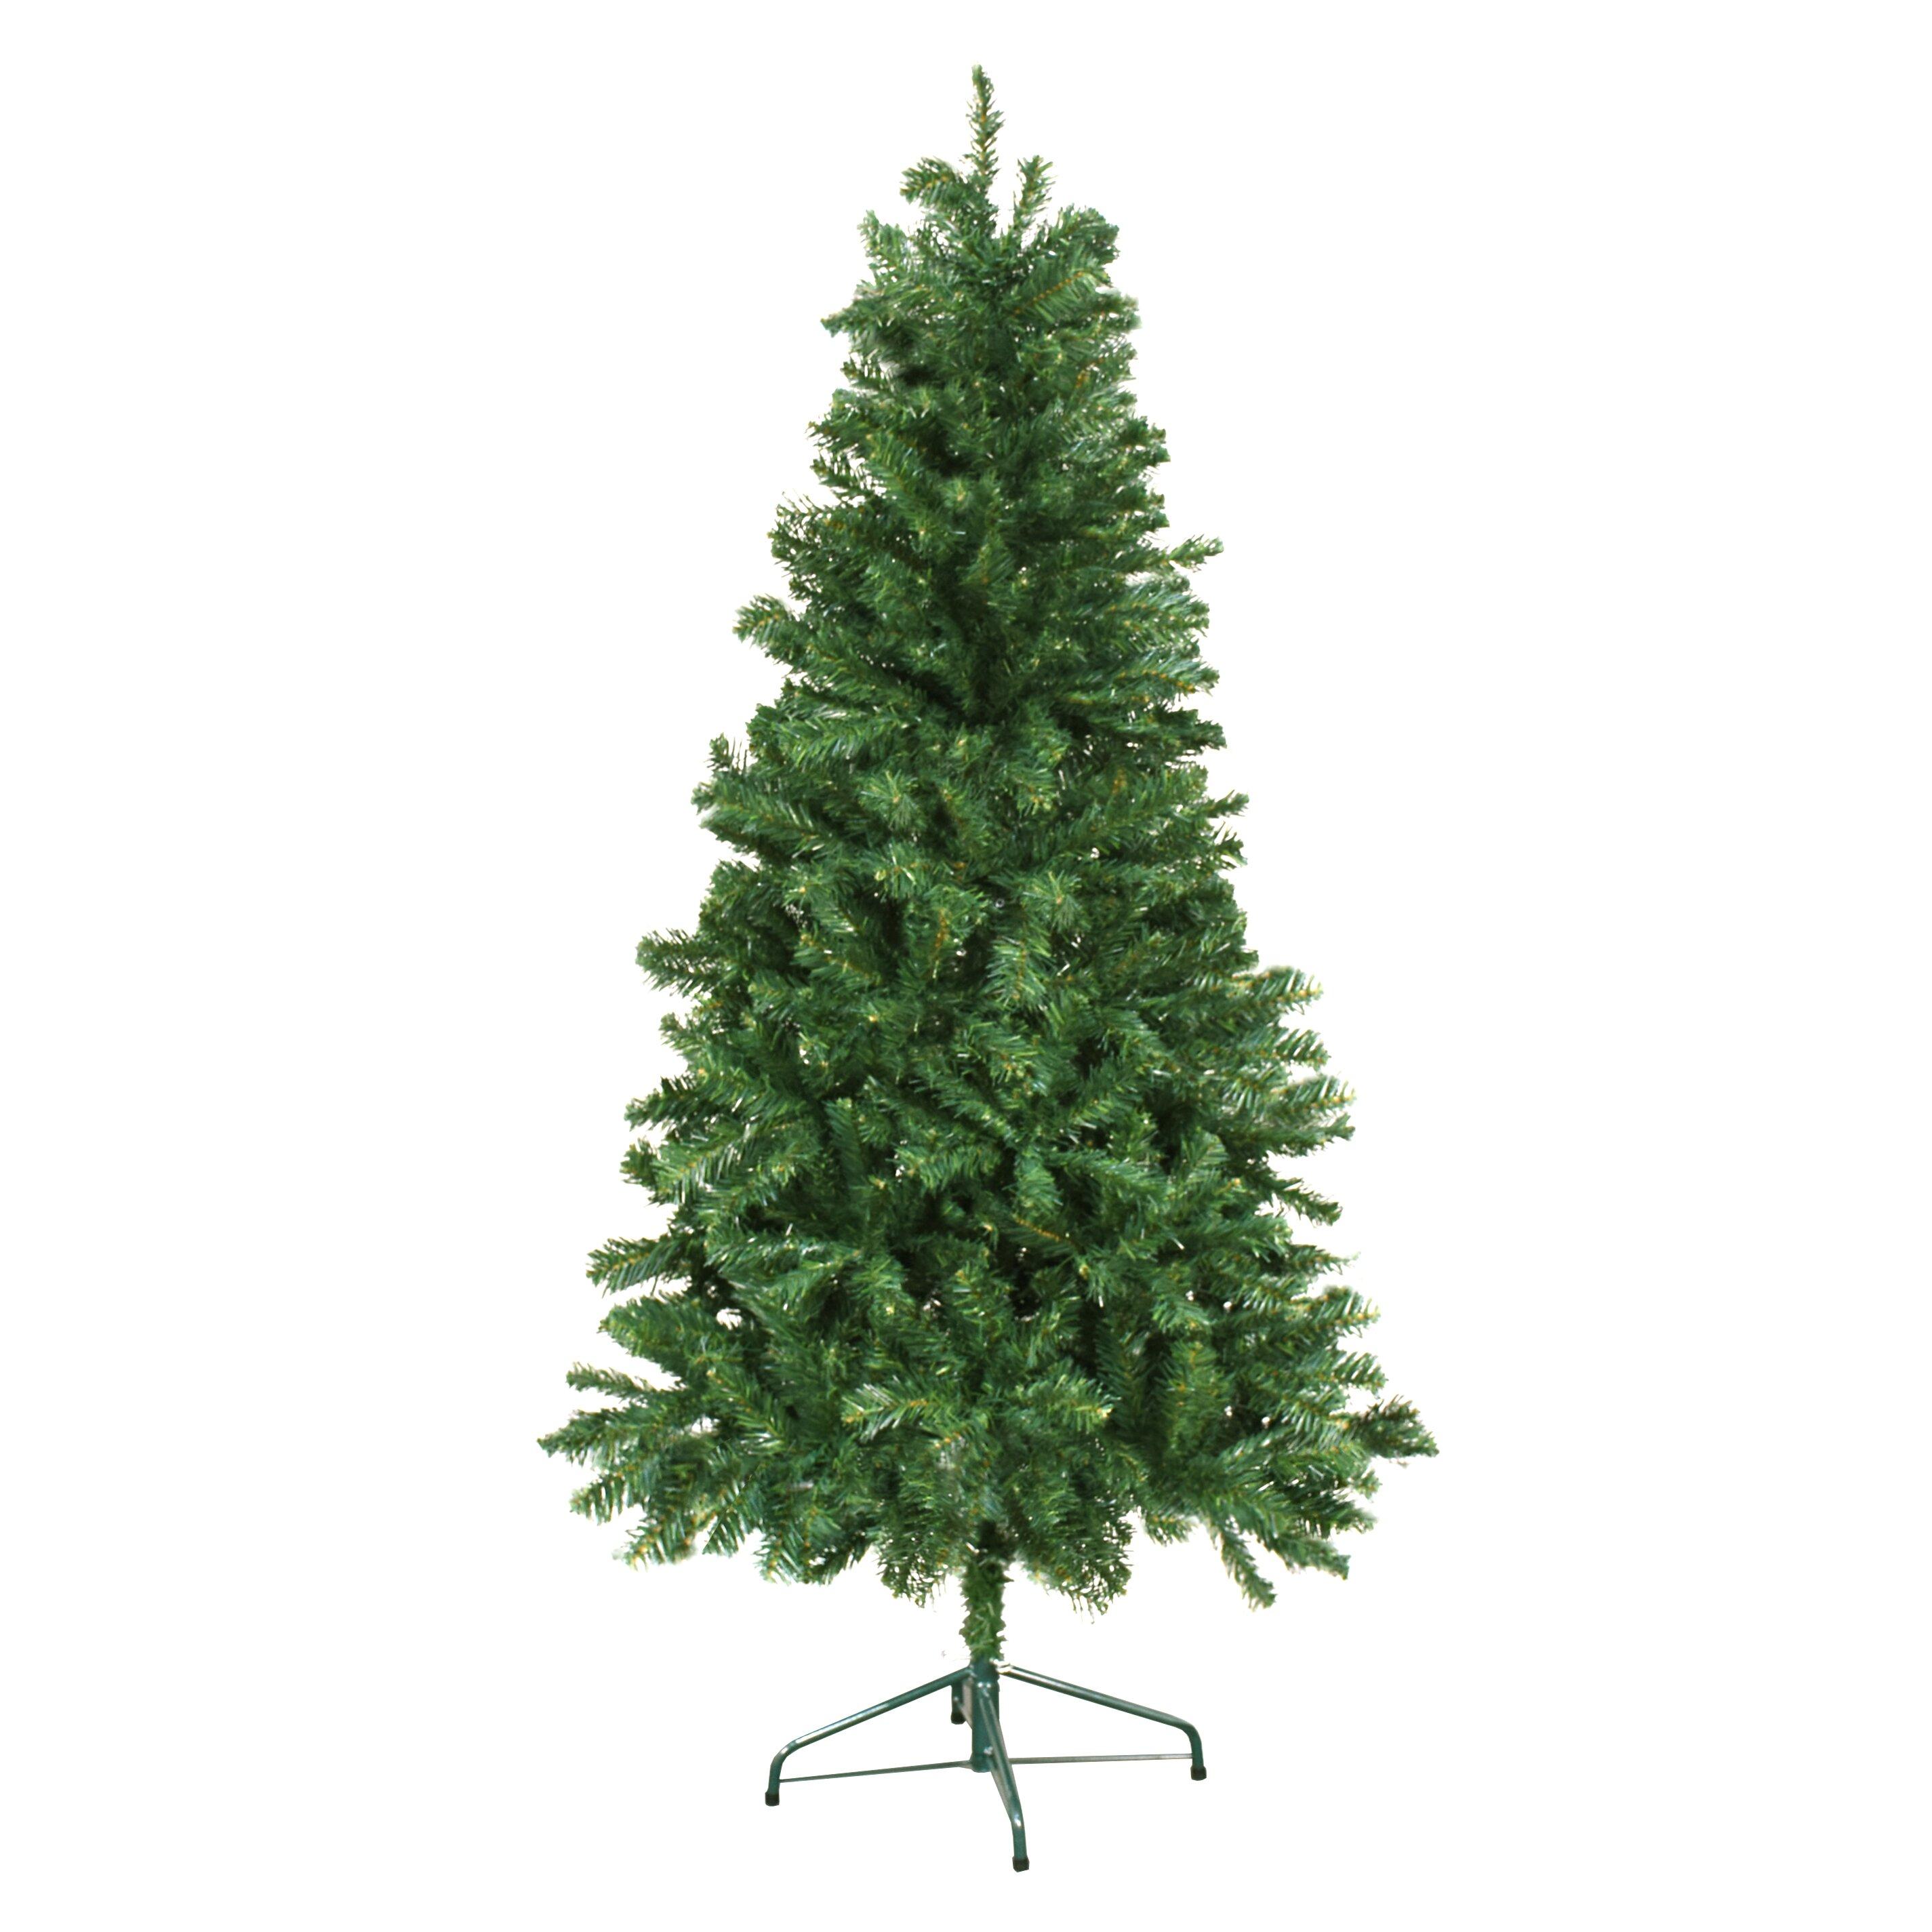 Astella 6' Green Douglas Fir Artificial Christmas Tree with Stand ...